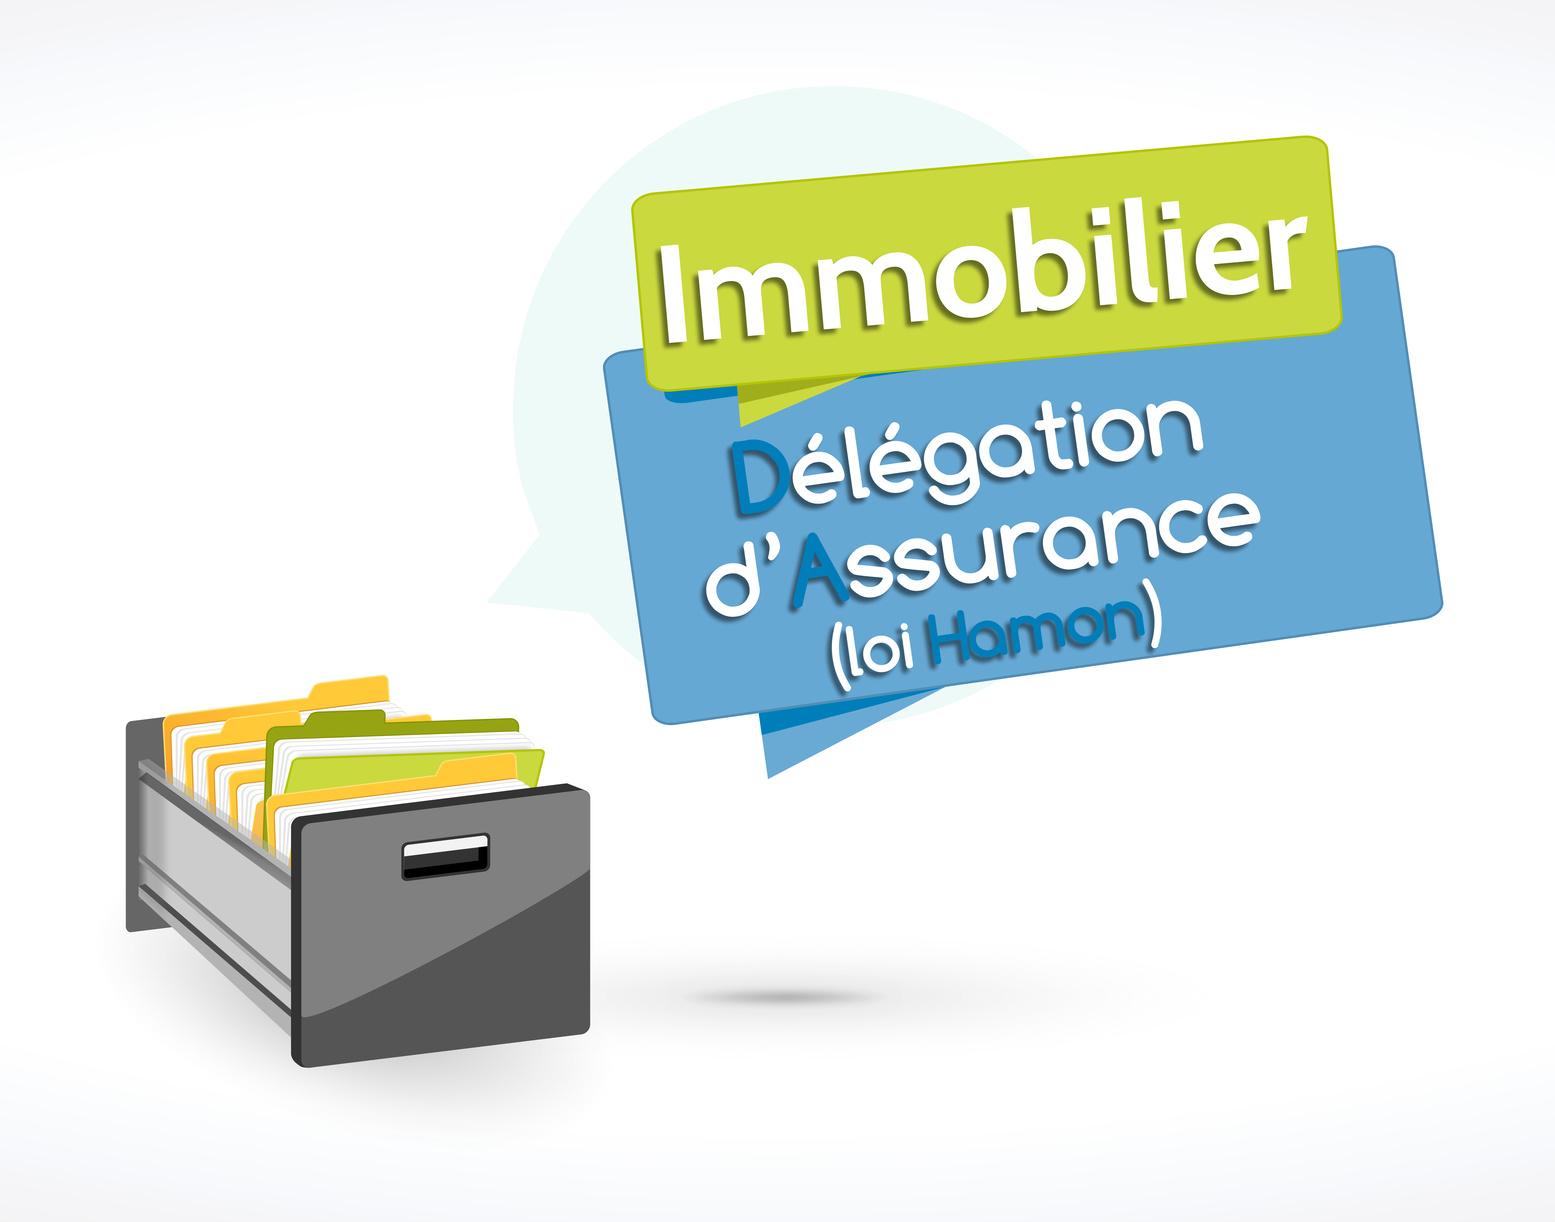 immobilier : Dlgation dassurance (loi Hamon)